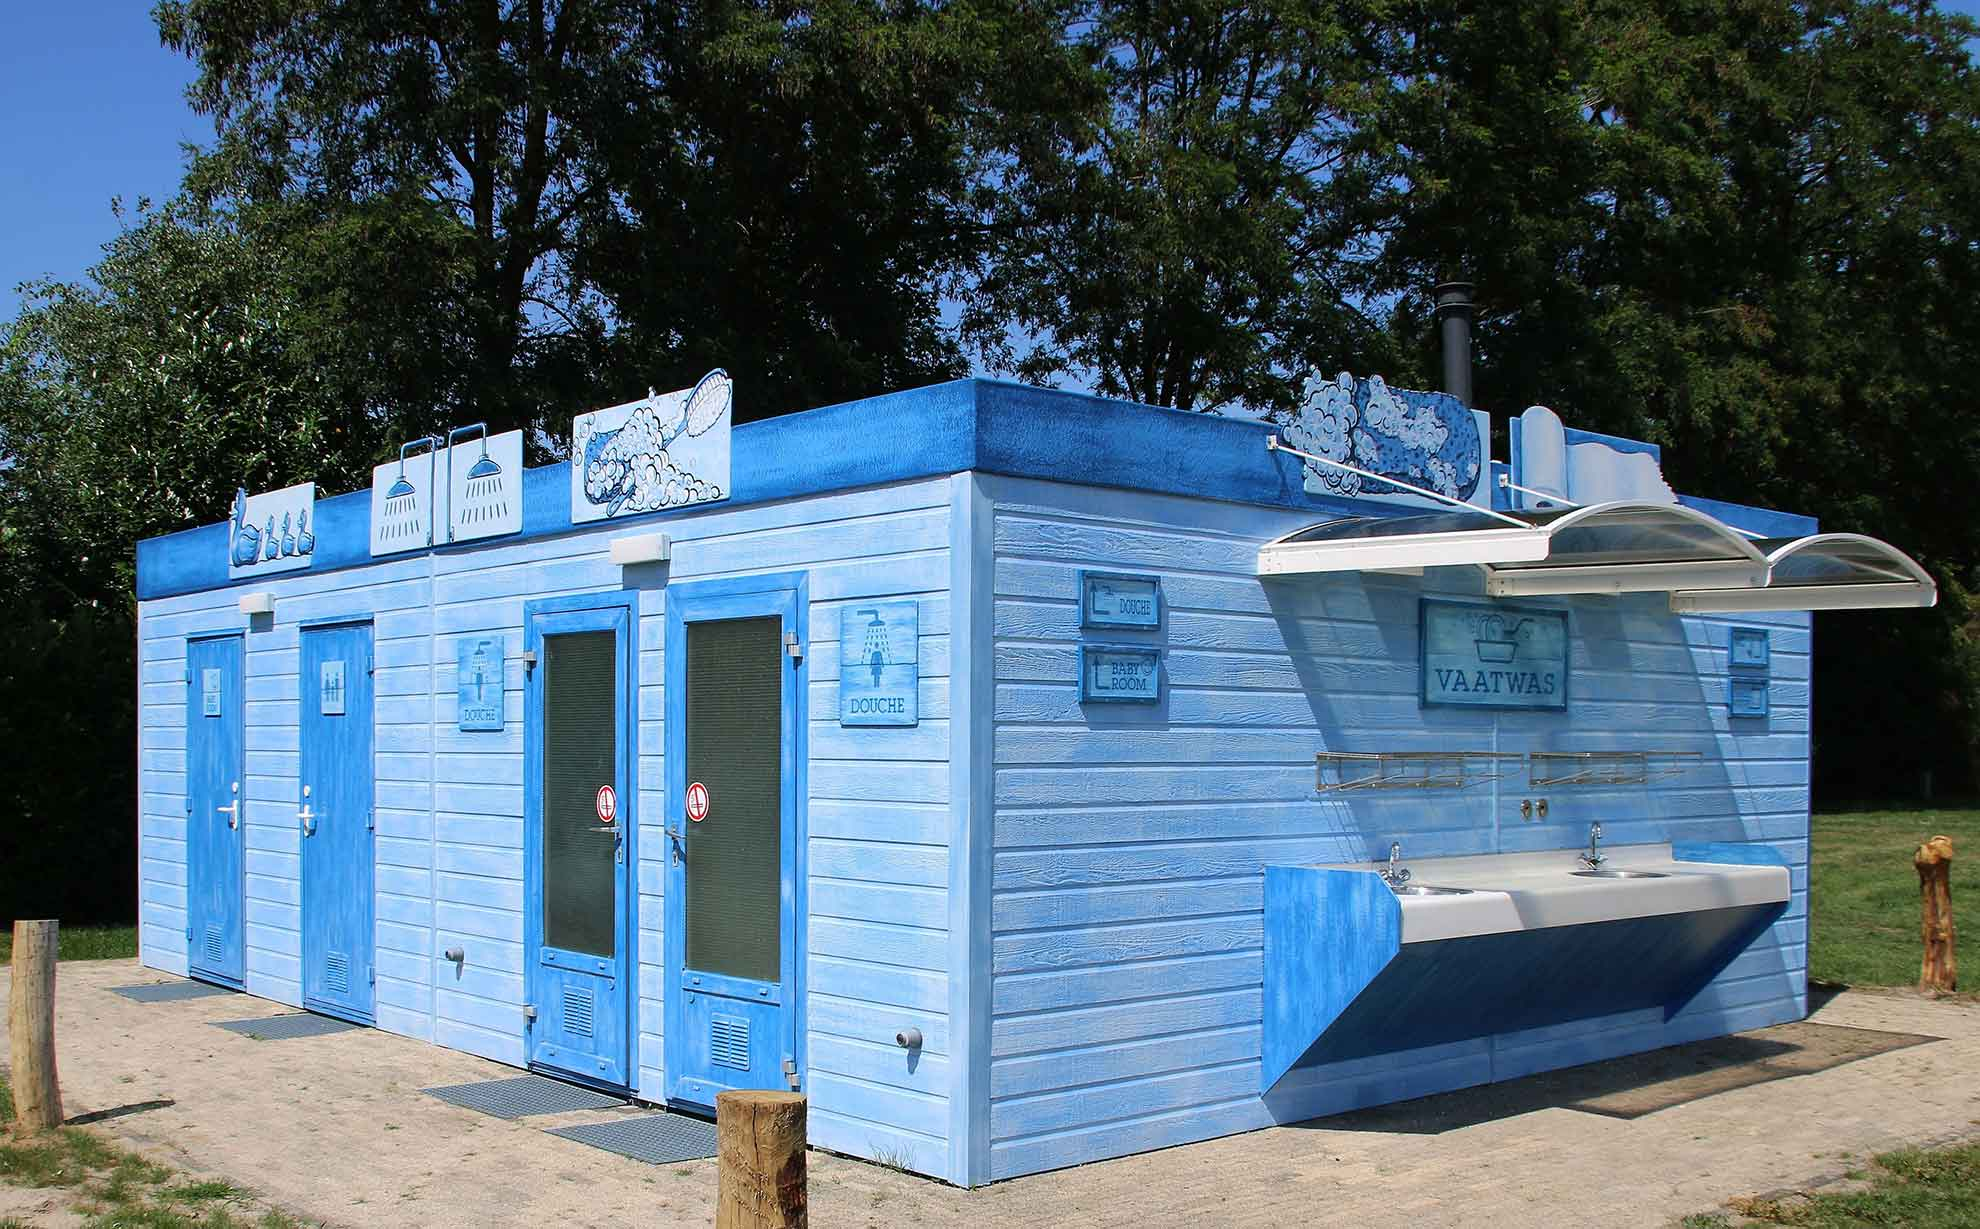 Sanitäranlagen auf dem Campingplatz Het Stoetenslagh - Sanitäranlagen auf dem Campingplatz het Stoetenslagh